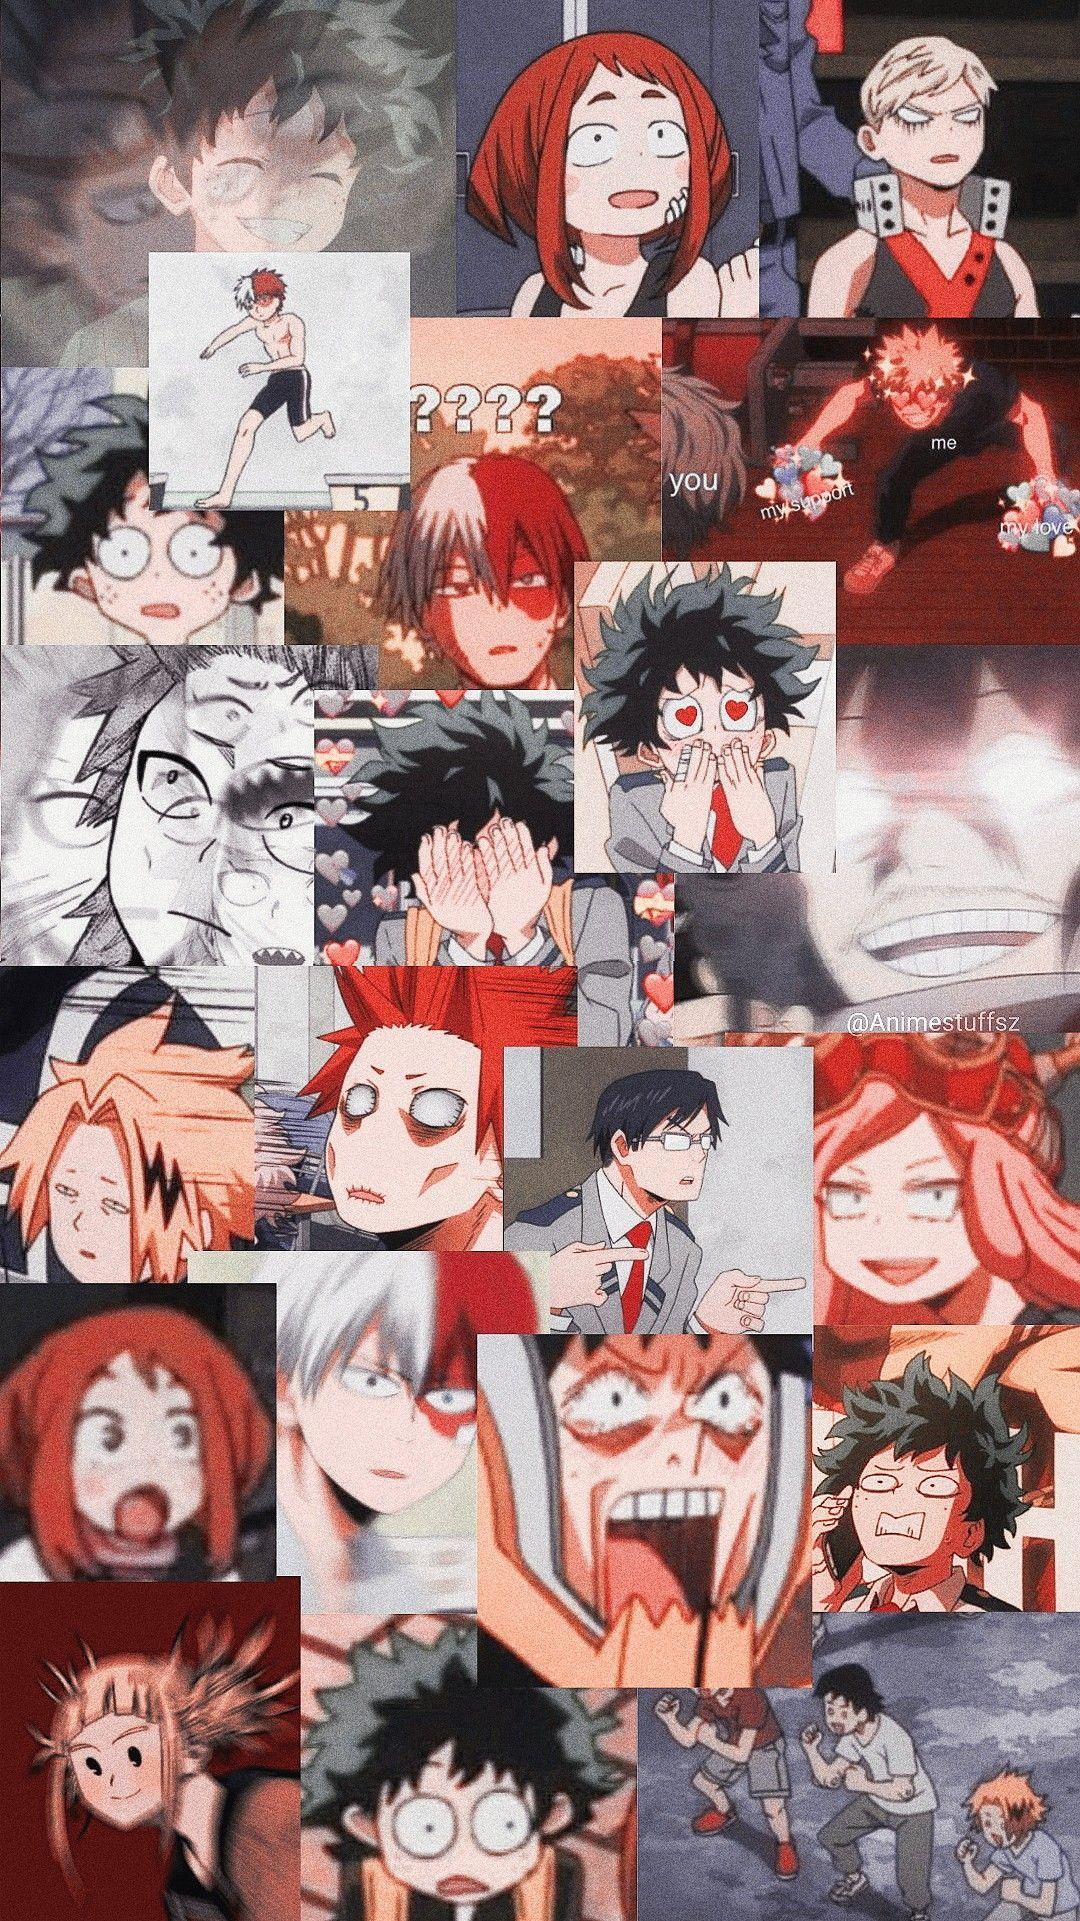 Get Easy Anime Wallpaper Iphone My Hero Academia Boku No Hero Academia In 2020 Anime Wallpaper Iphone Anime Wallpaper Hero Wallpaper